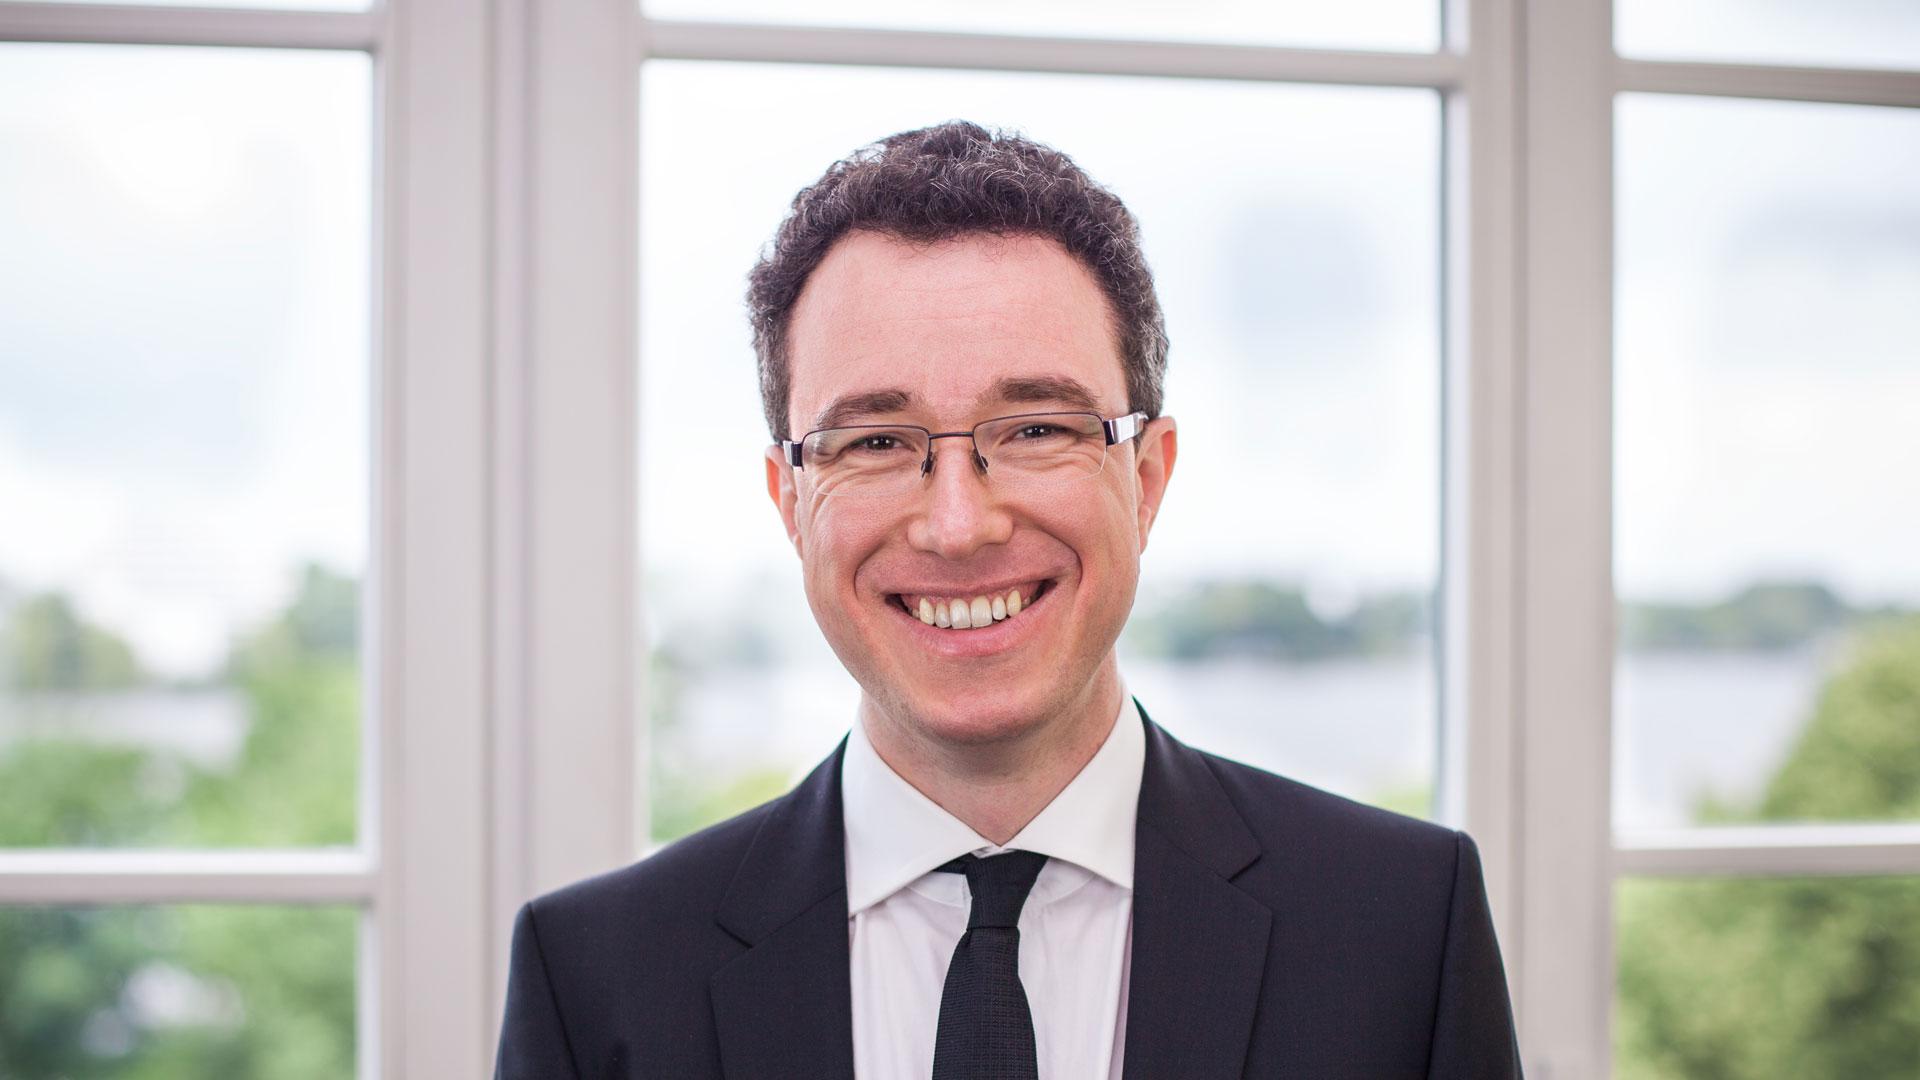 Dr.-Ing. Daniel-Hendrik Gosslar